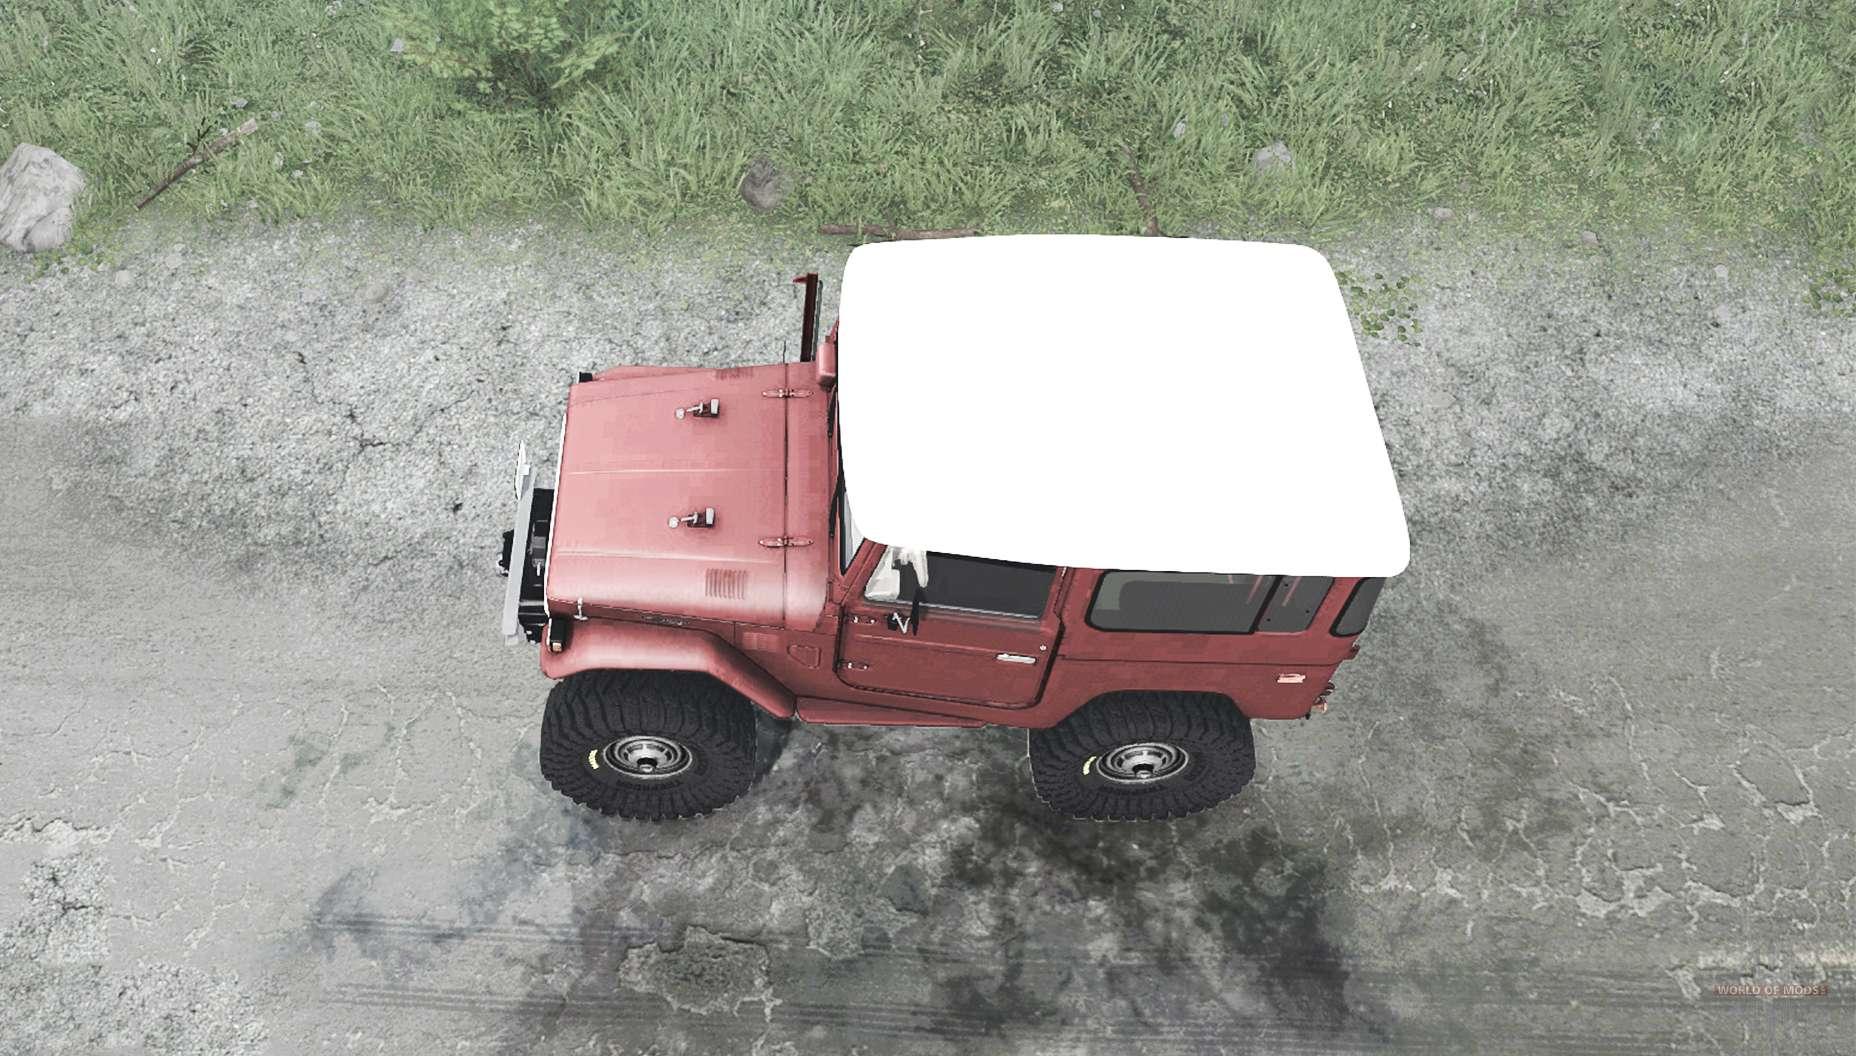 Toyota land cruiser hard top bj40vl para mudrunner toyota land cruiser hard top bj40vl para spintires mudrunner fandeluxe Image collections